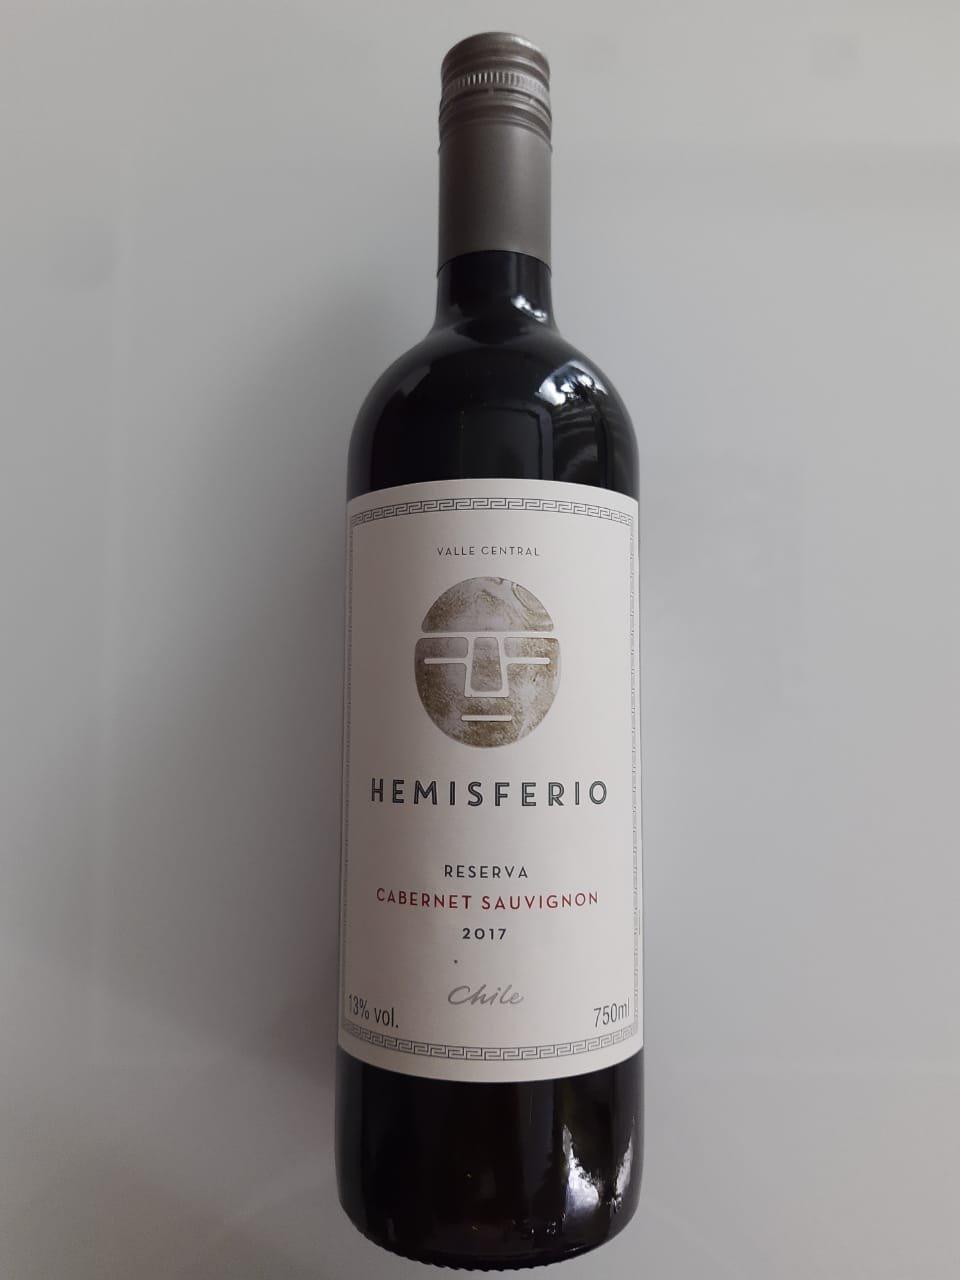 Vinho Hemisferio Reserva Cabernet Sauvignon 750ml